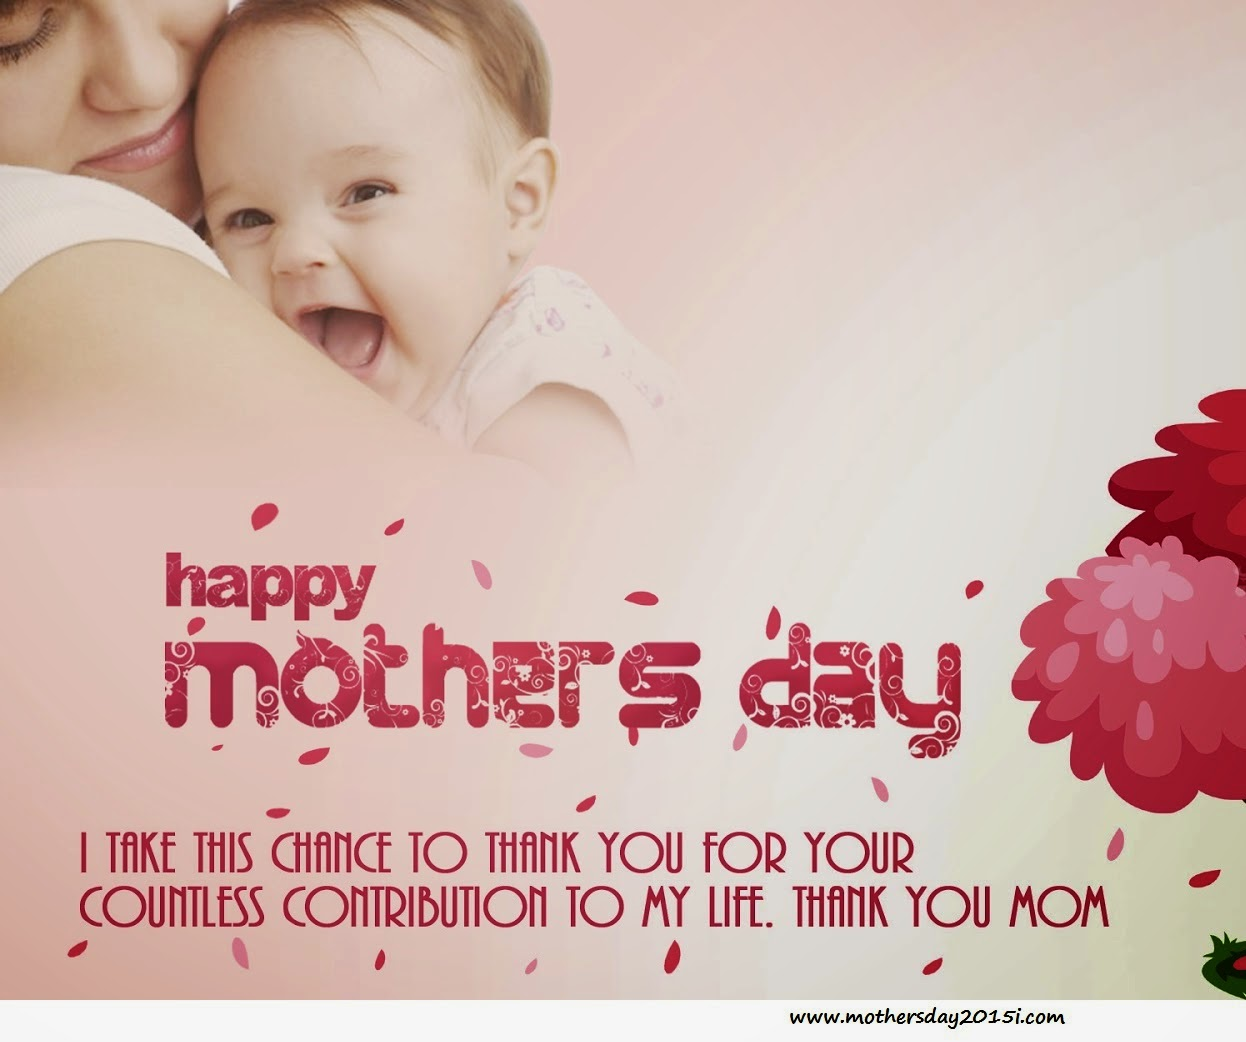 Mothers day cards happy mothers day 2015 happy mothers day card 2015 m4hsunfo